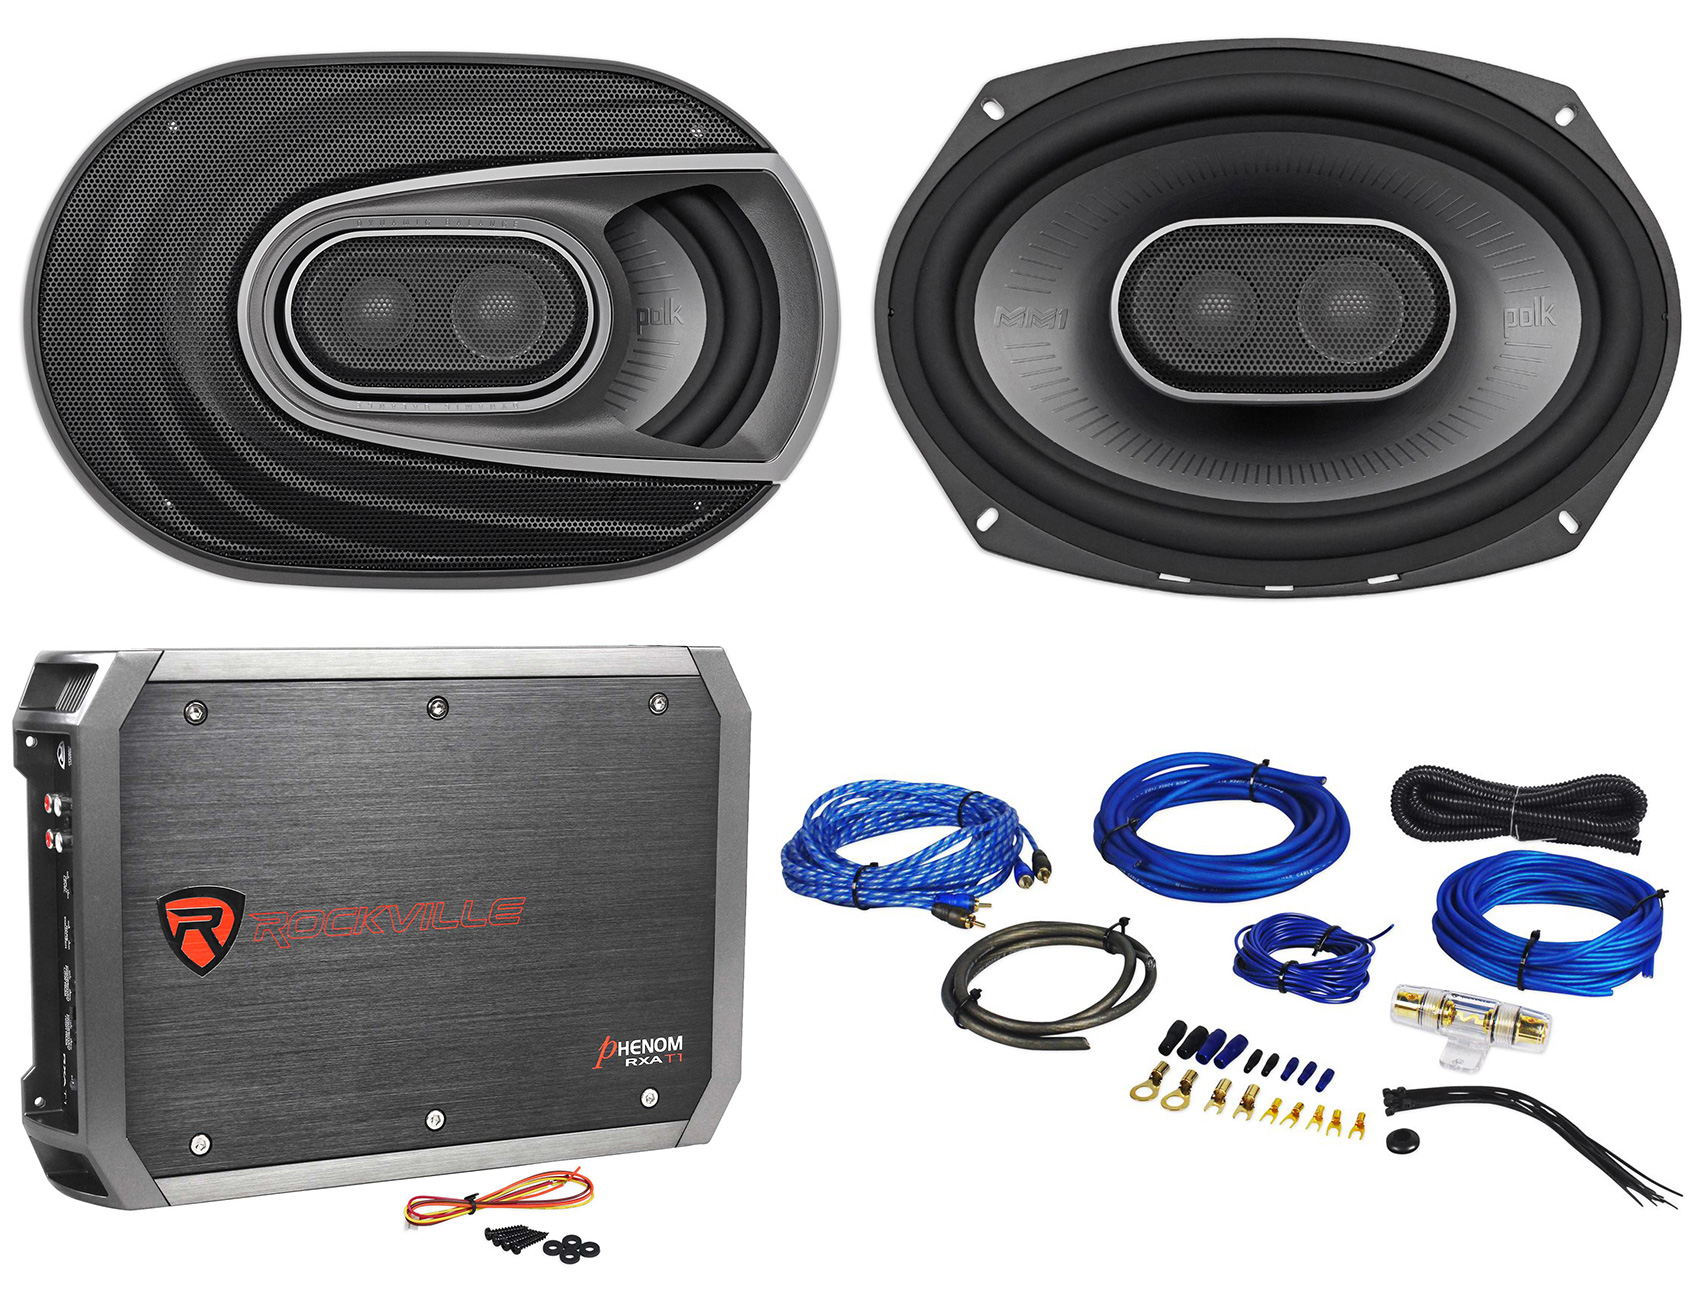 medium resolution of polk audio car subwoofer wiring kits wiring diagrams home audio subwoofer wiring 2 polk audio